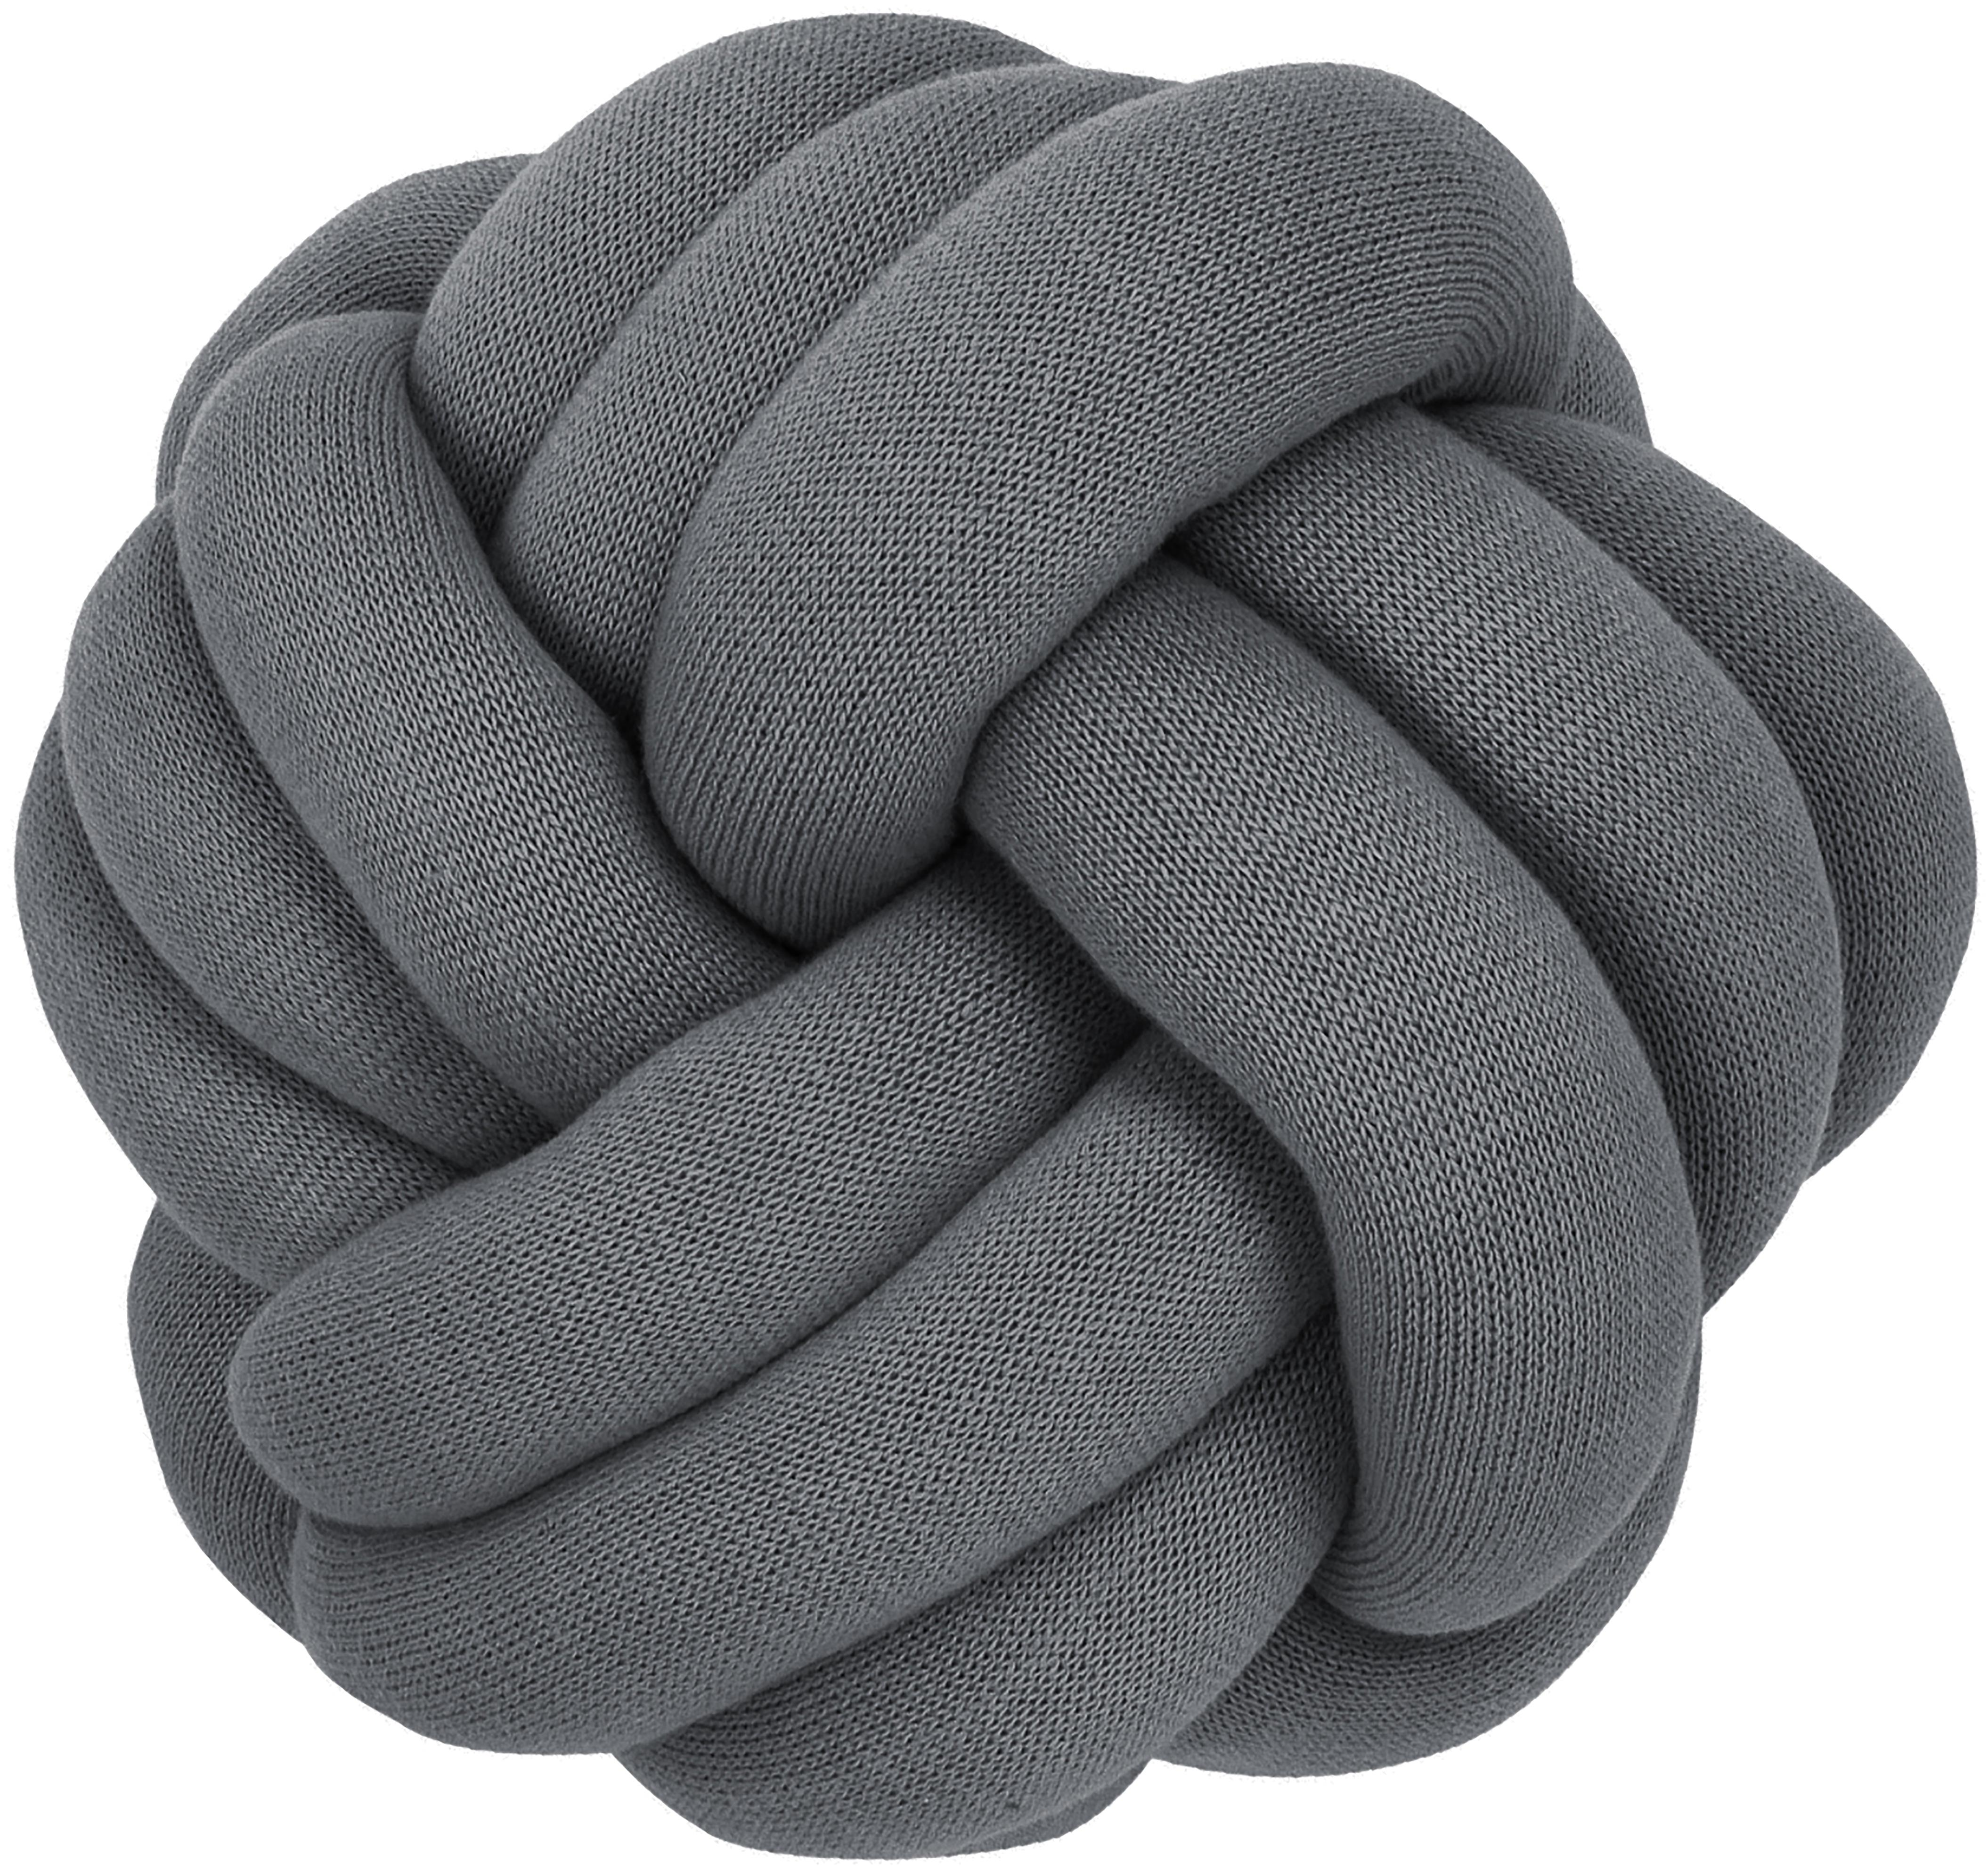 Kussen Twist, Donkergrijs, Ø 30 cm